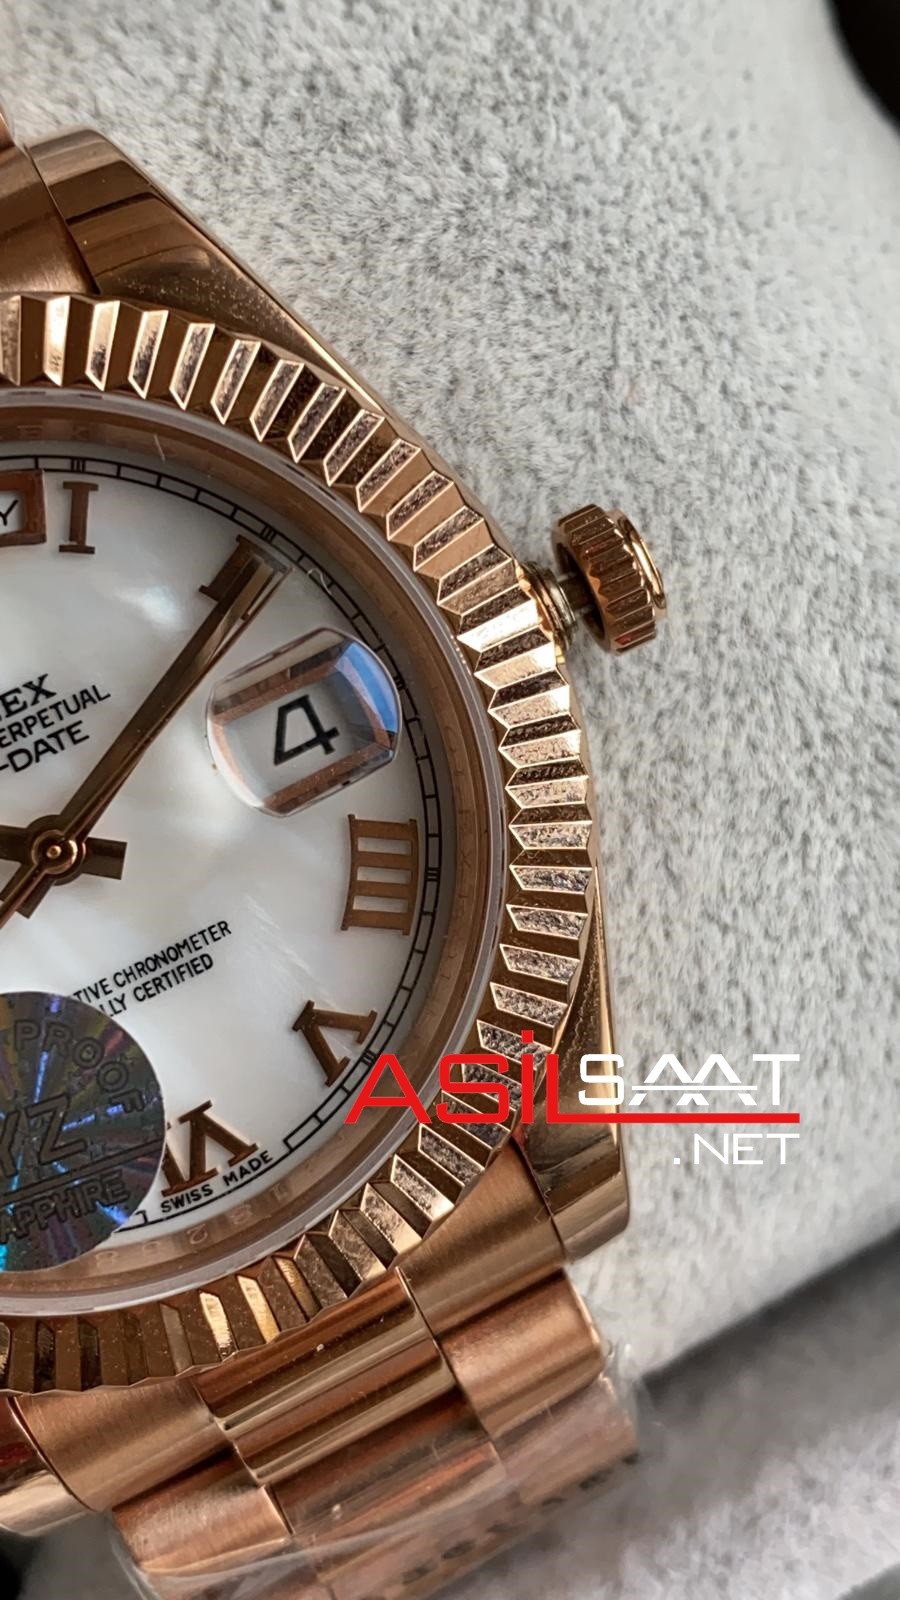 Rolex Day-Date Rosegold Replika Saat ROLDD050